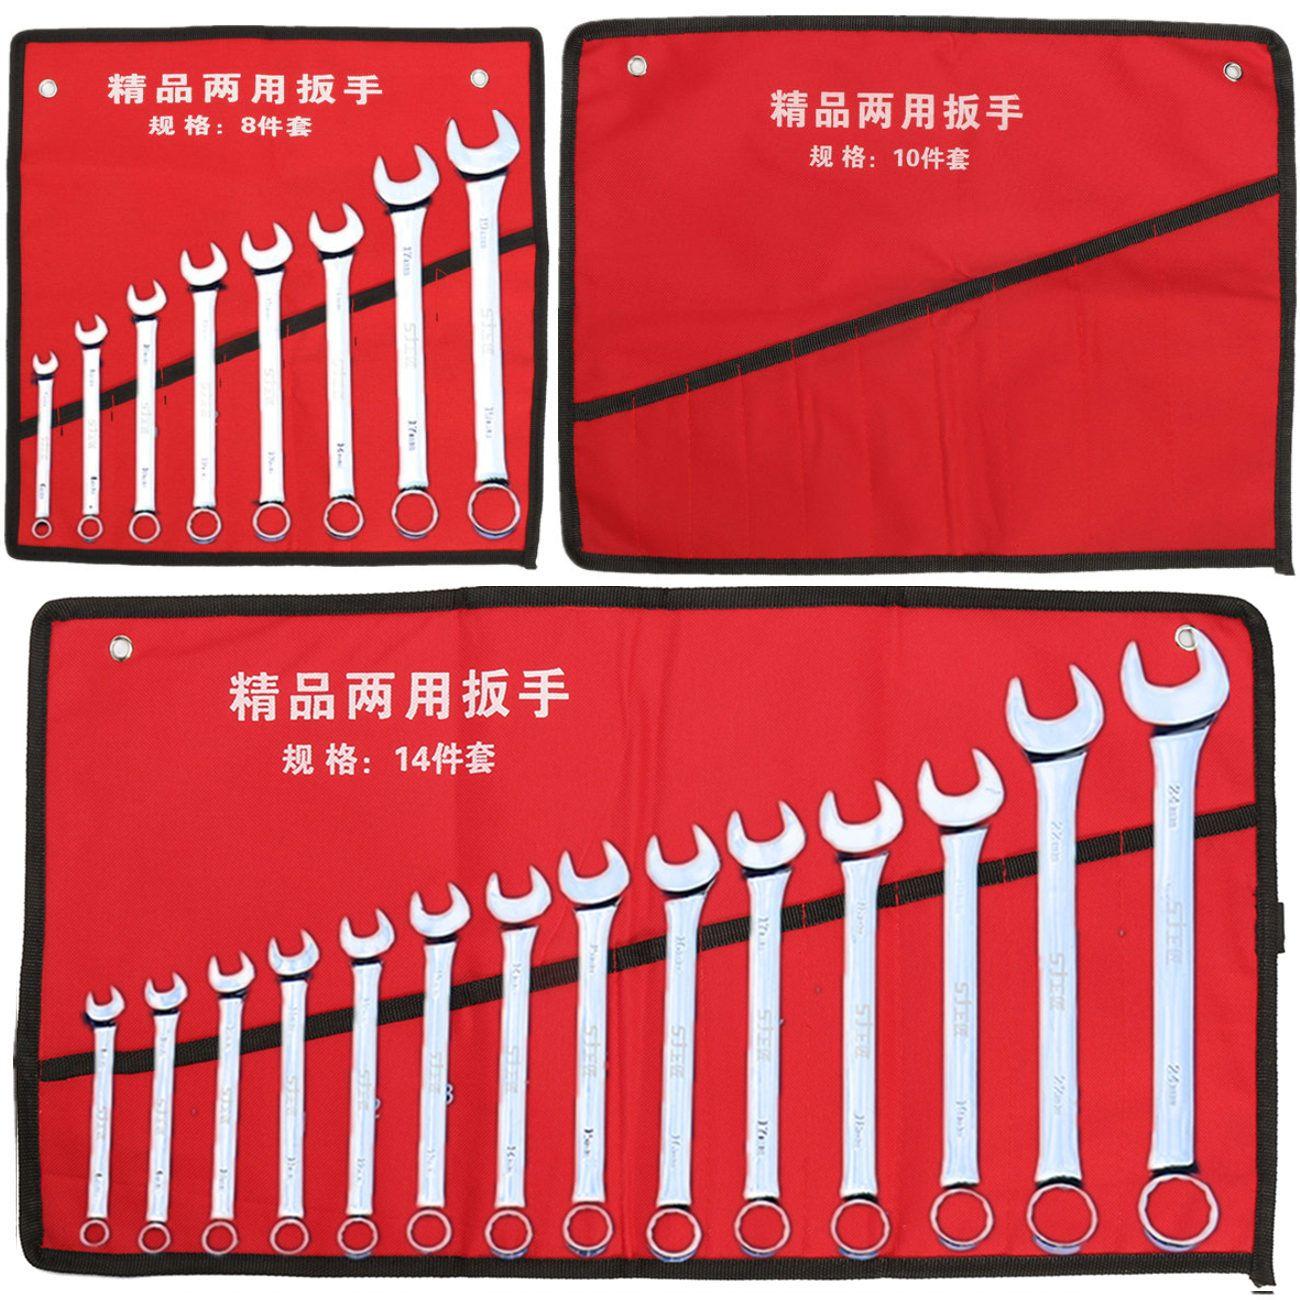 8 10 14 Pockets Roll Up Wrench font b Tools b font Storage font b Bag